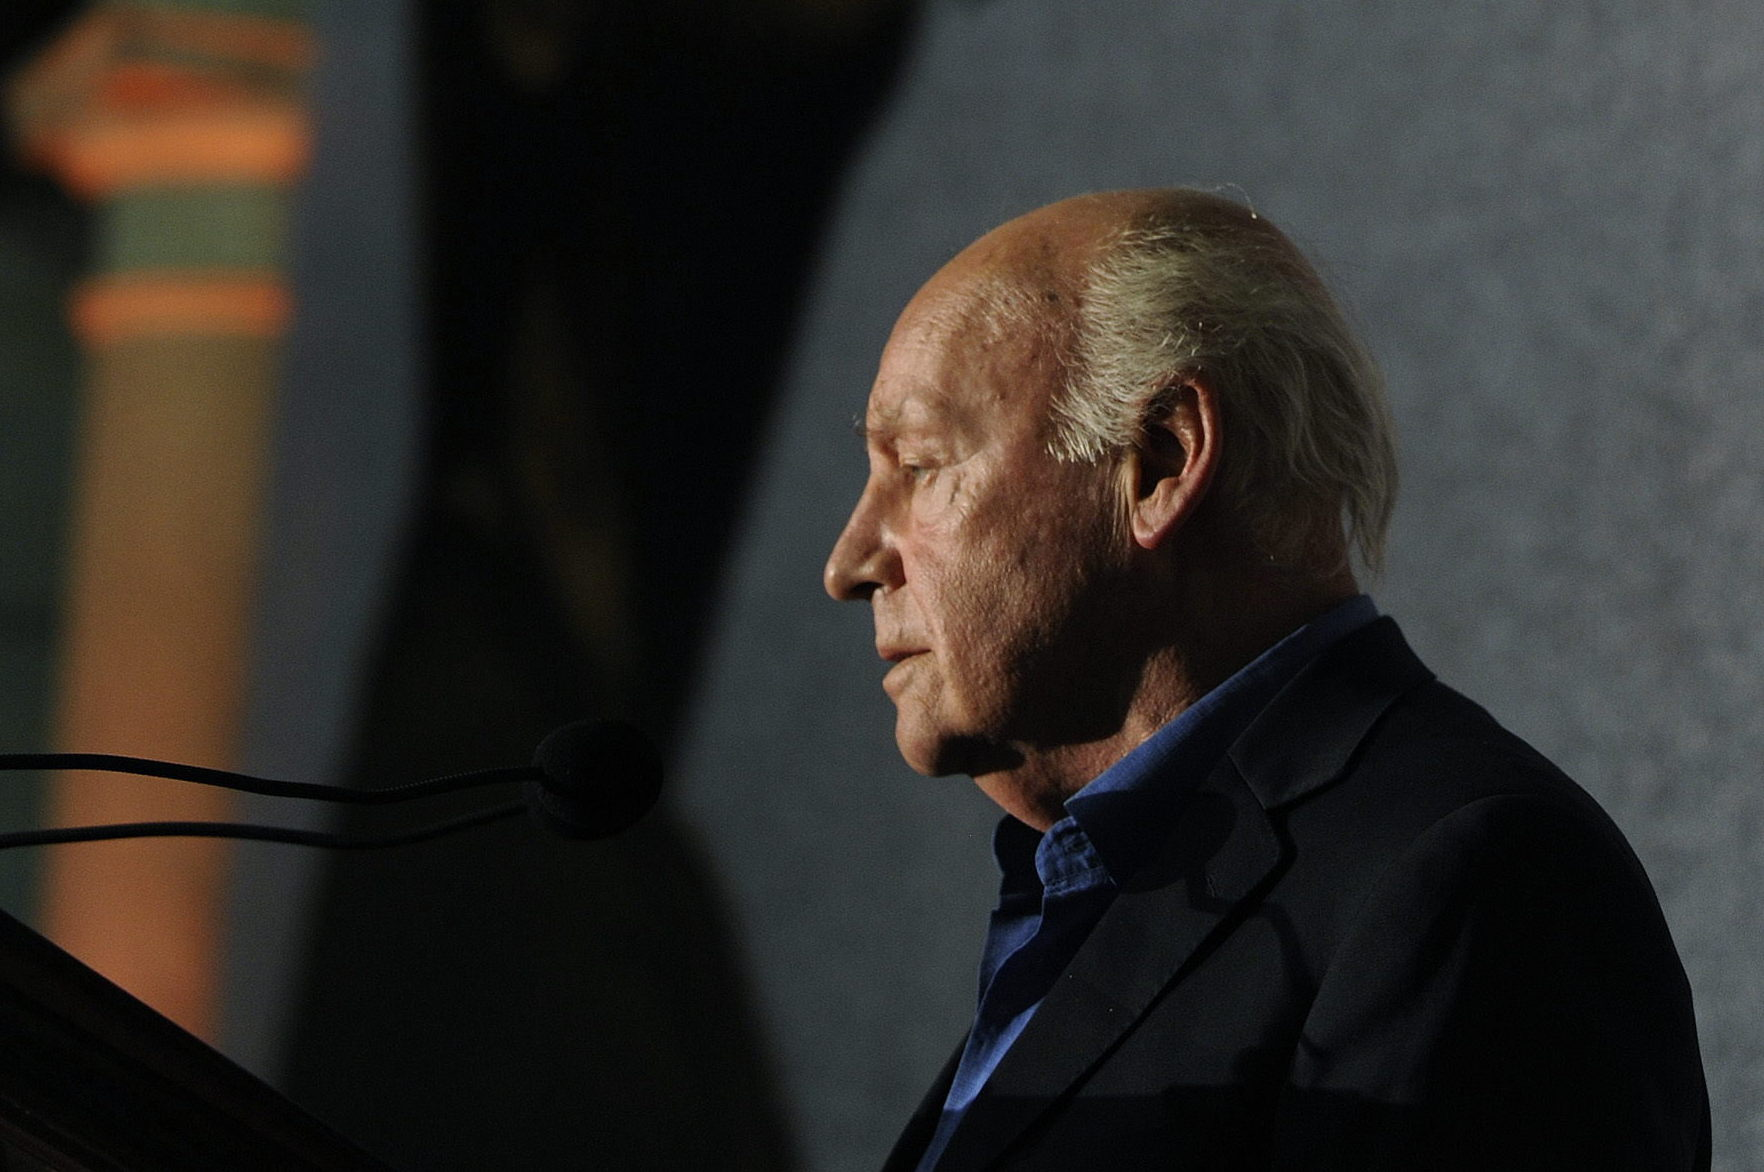 Wonderful Eduardo Galeano quotes about football